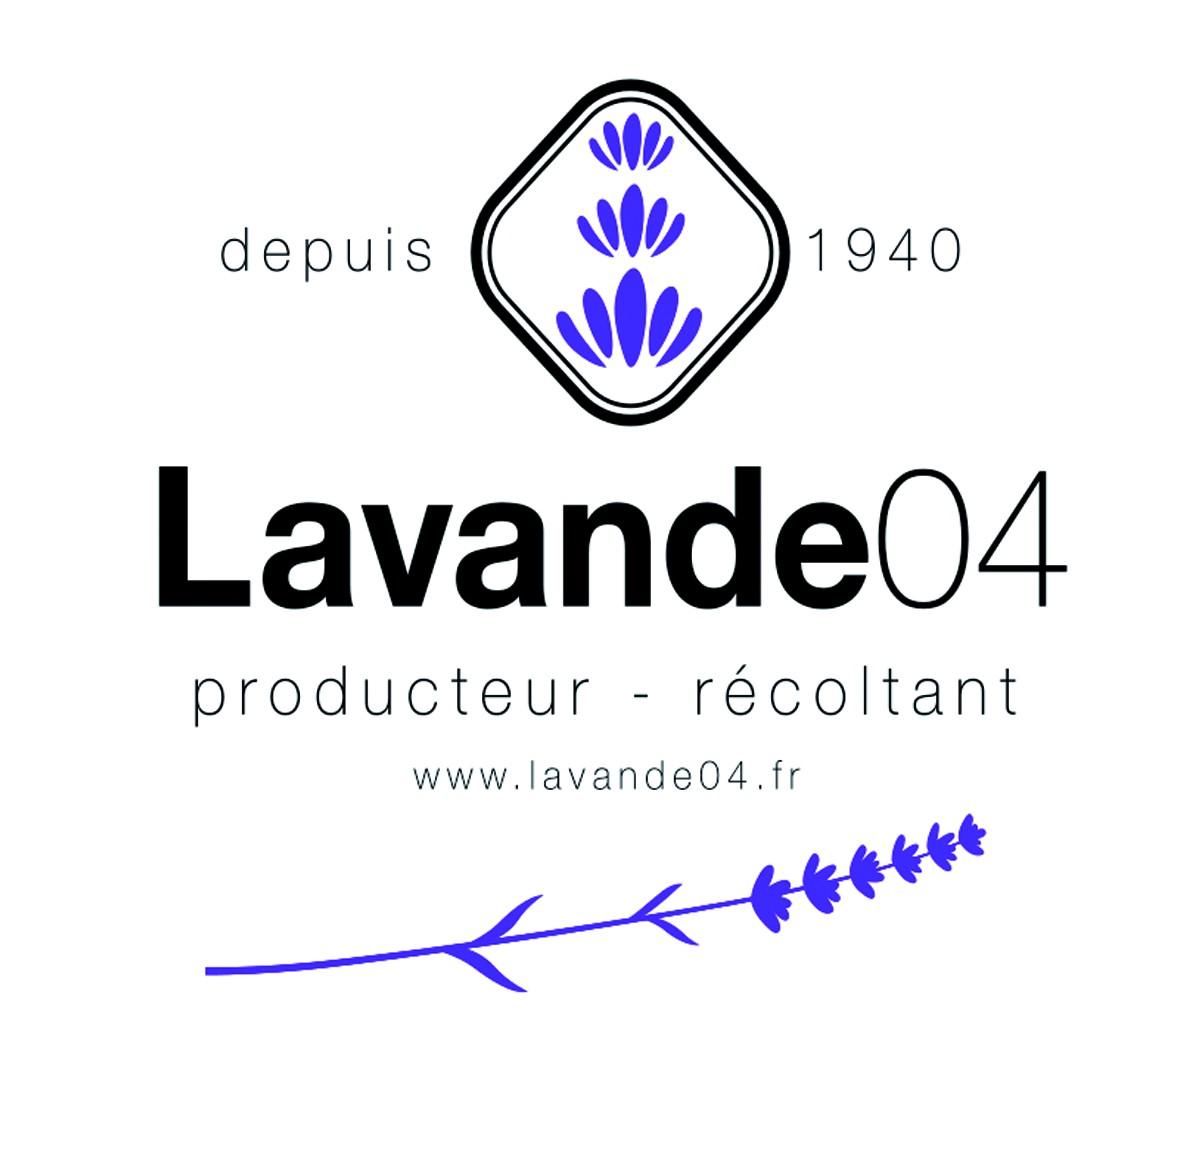 lavande04